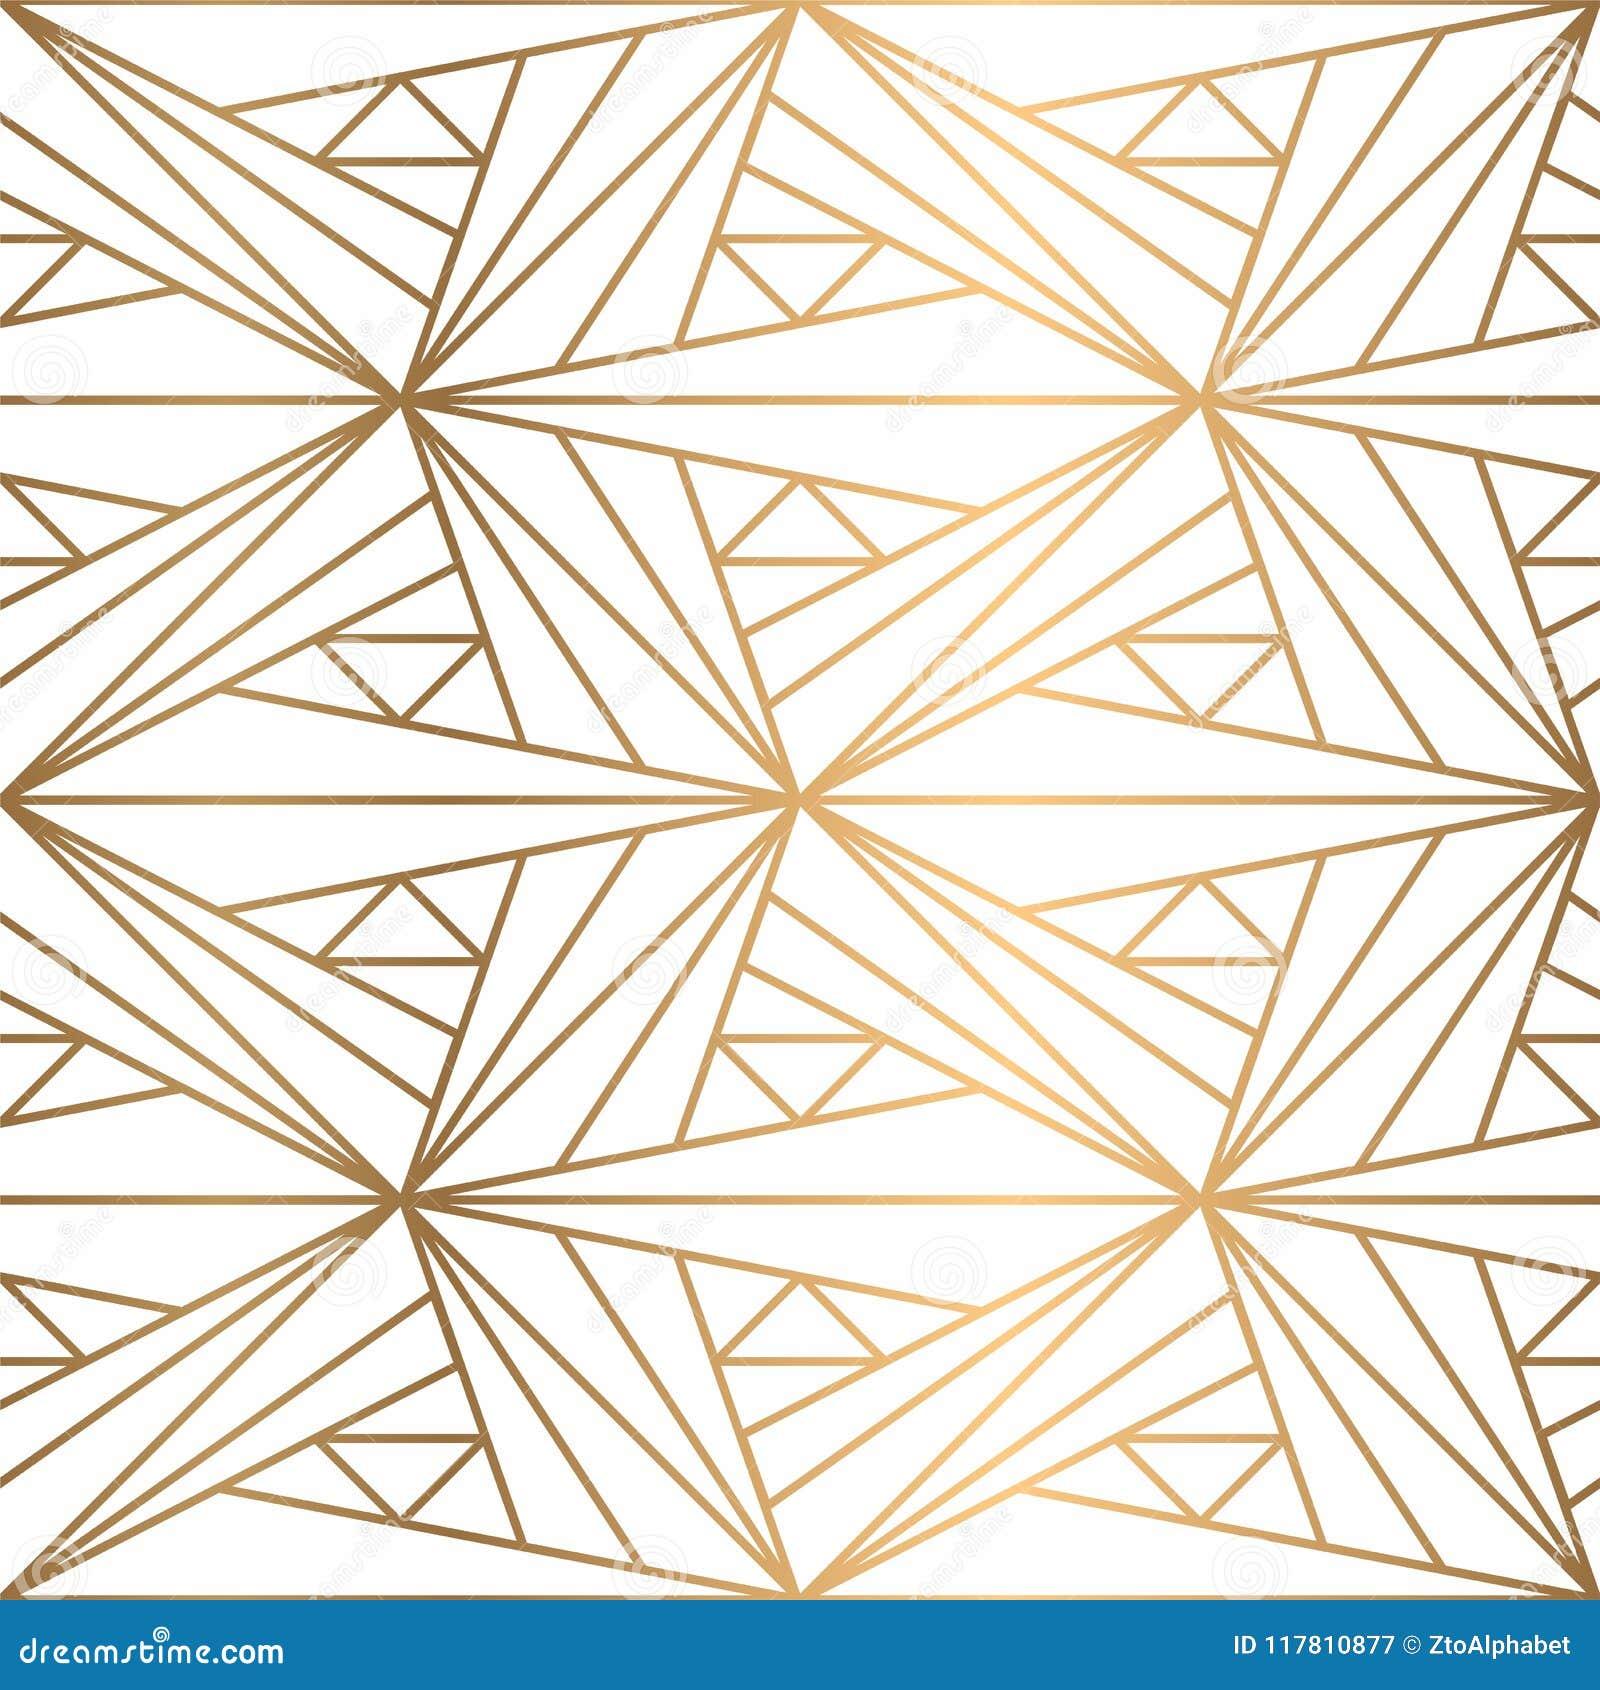 Shiny Geometric Shapes Pattern Stock Vector Illustration